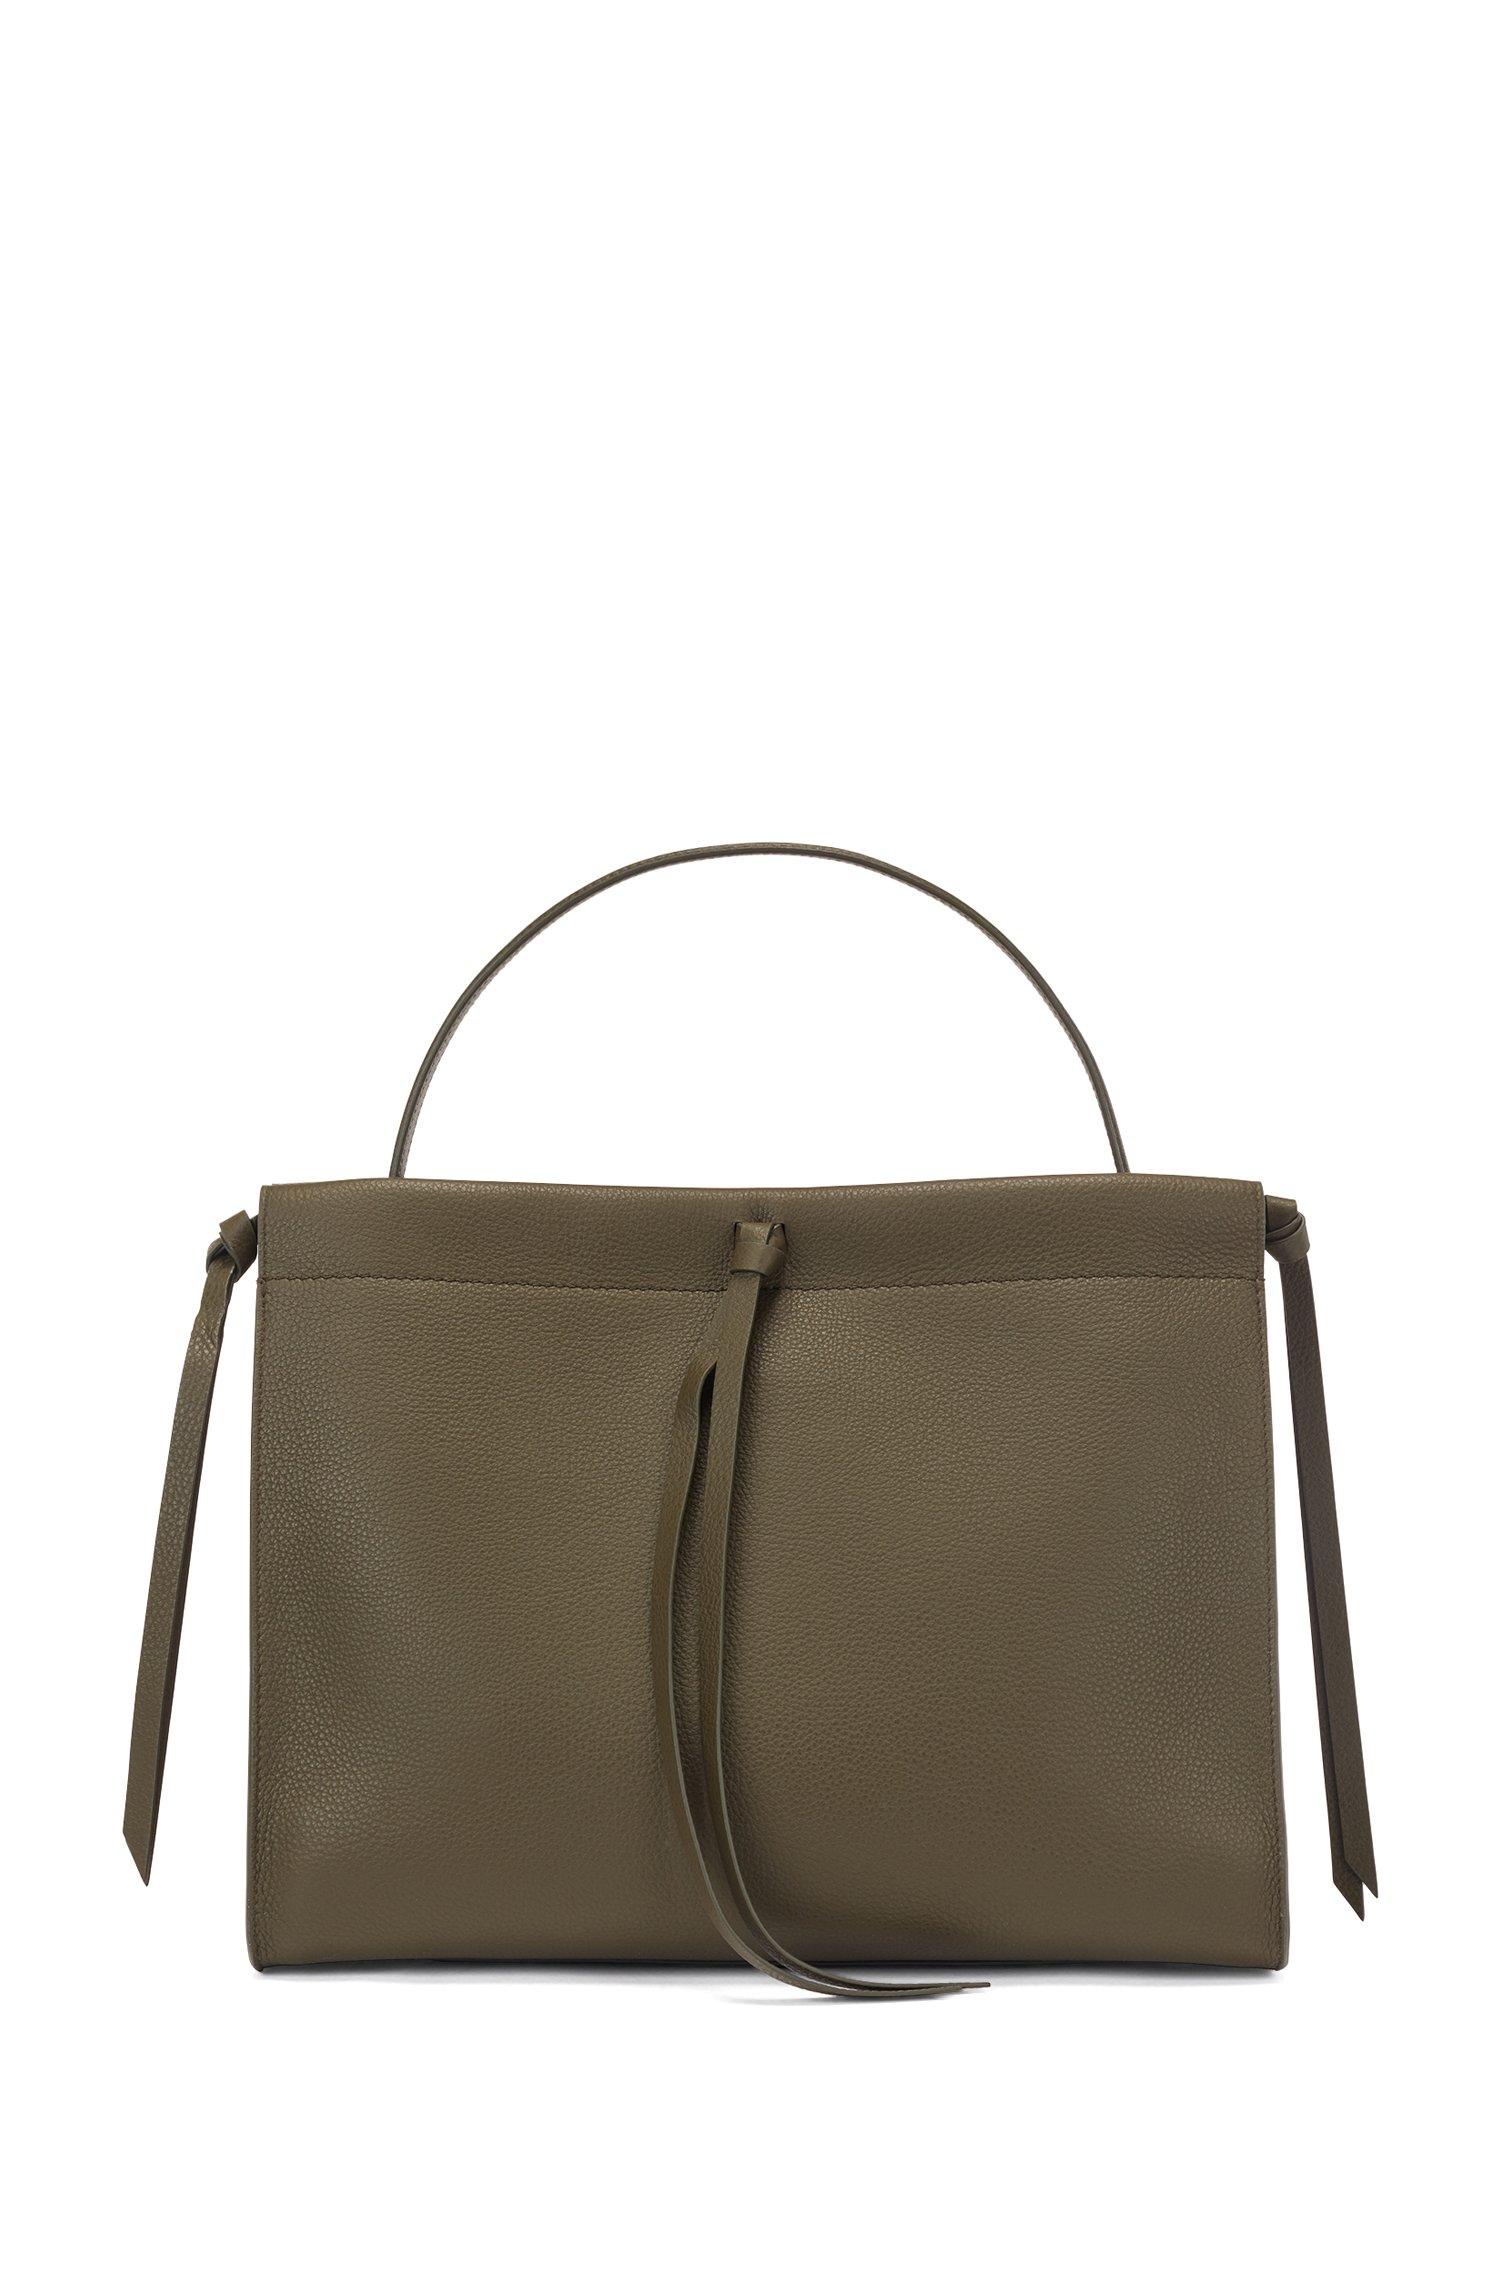 Tote bag in Italian leather with tassel detail, Dark Green